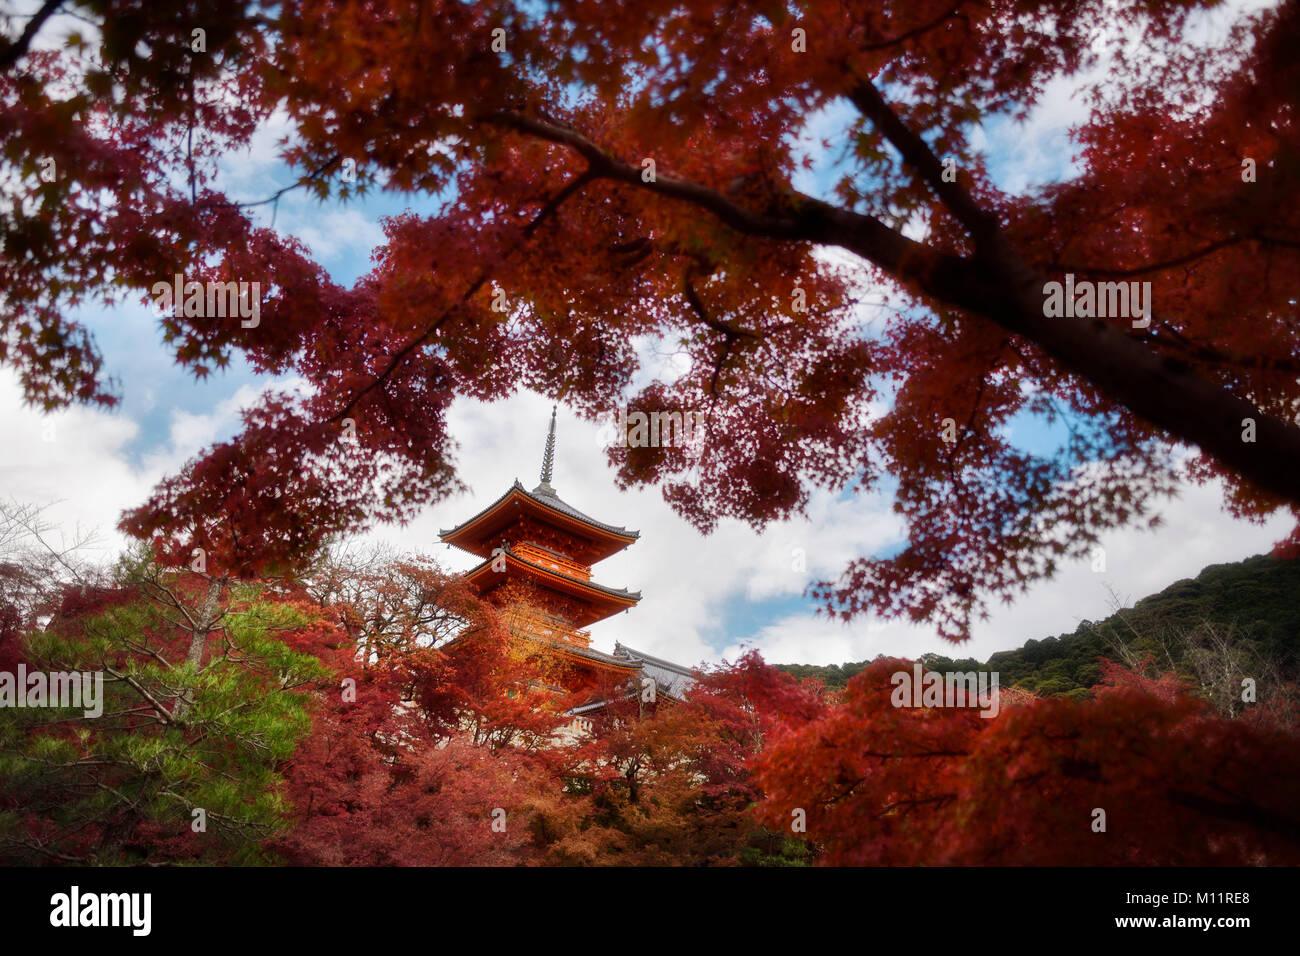 Beautiful autumn scenery with red Japanese maples and Sanjunoto pagoda of Kiyomizu-dera Buddhist temple in Higashiyama, Stock Photo